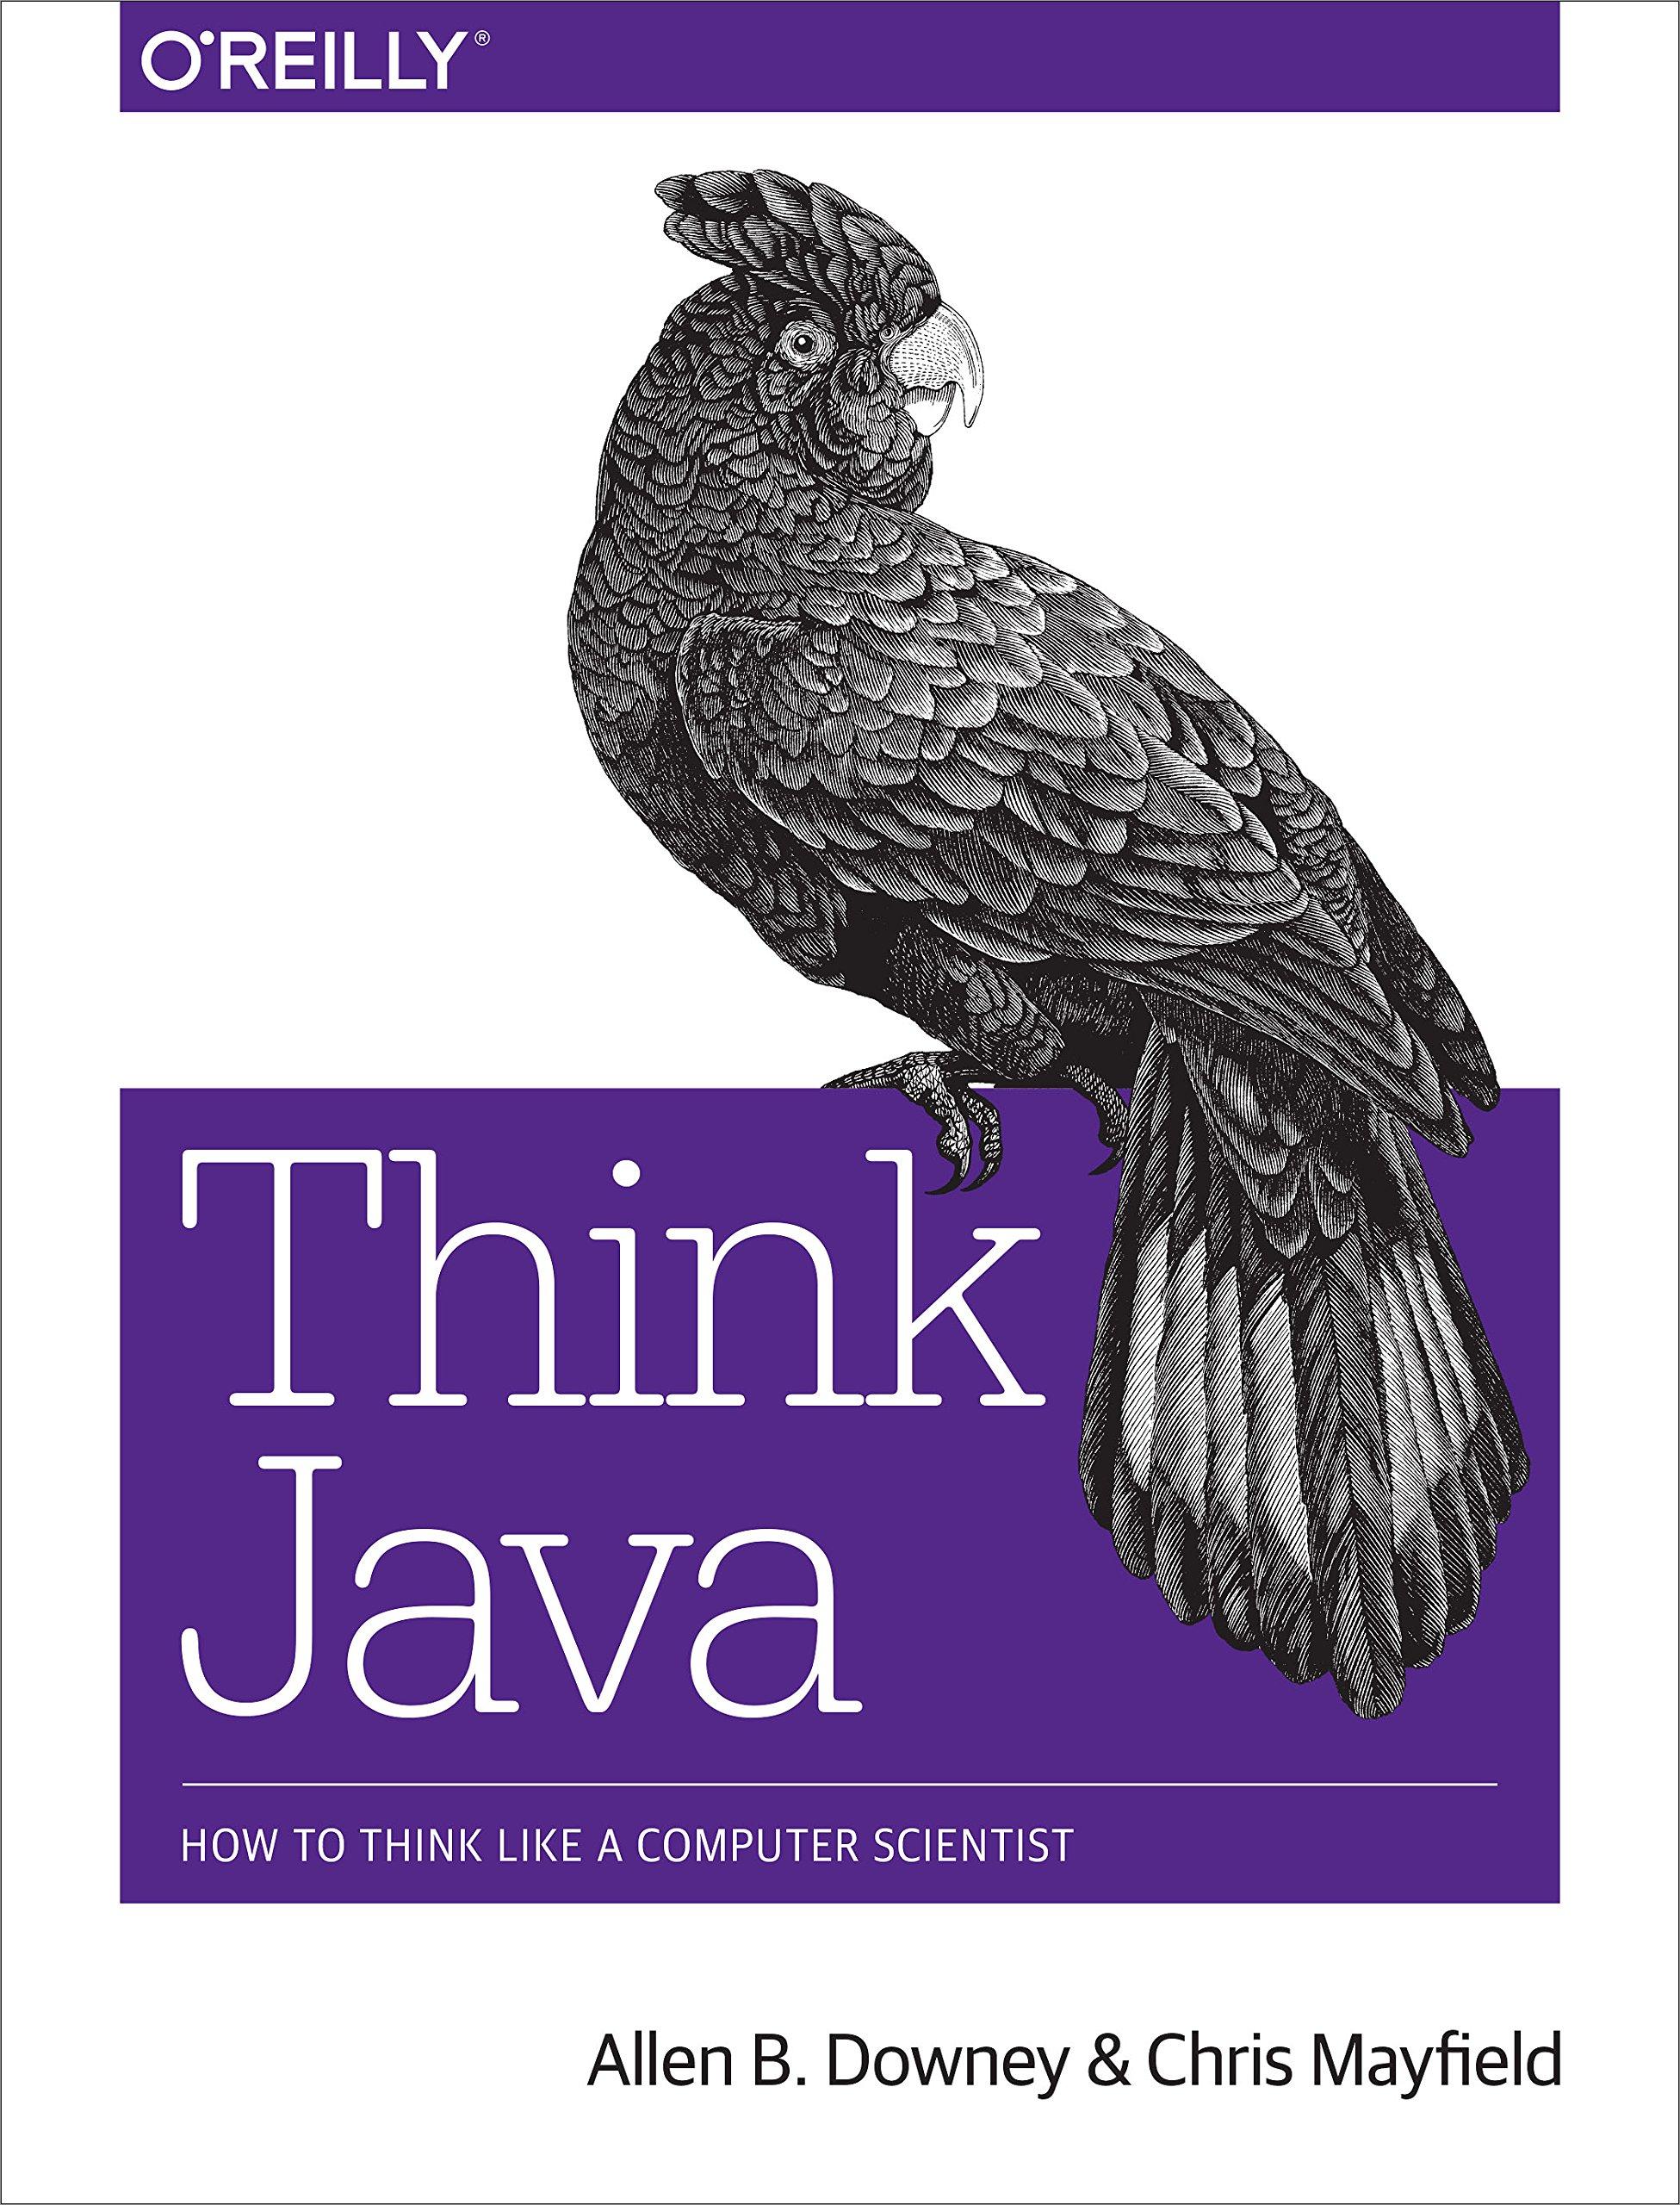 Think Java ISBN-13 9781491929568